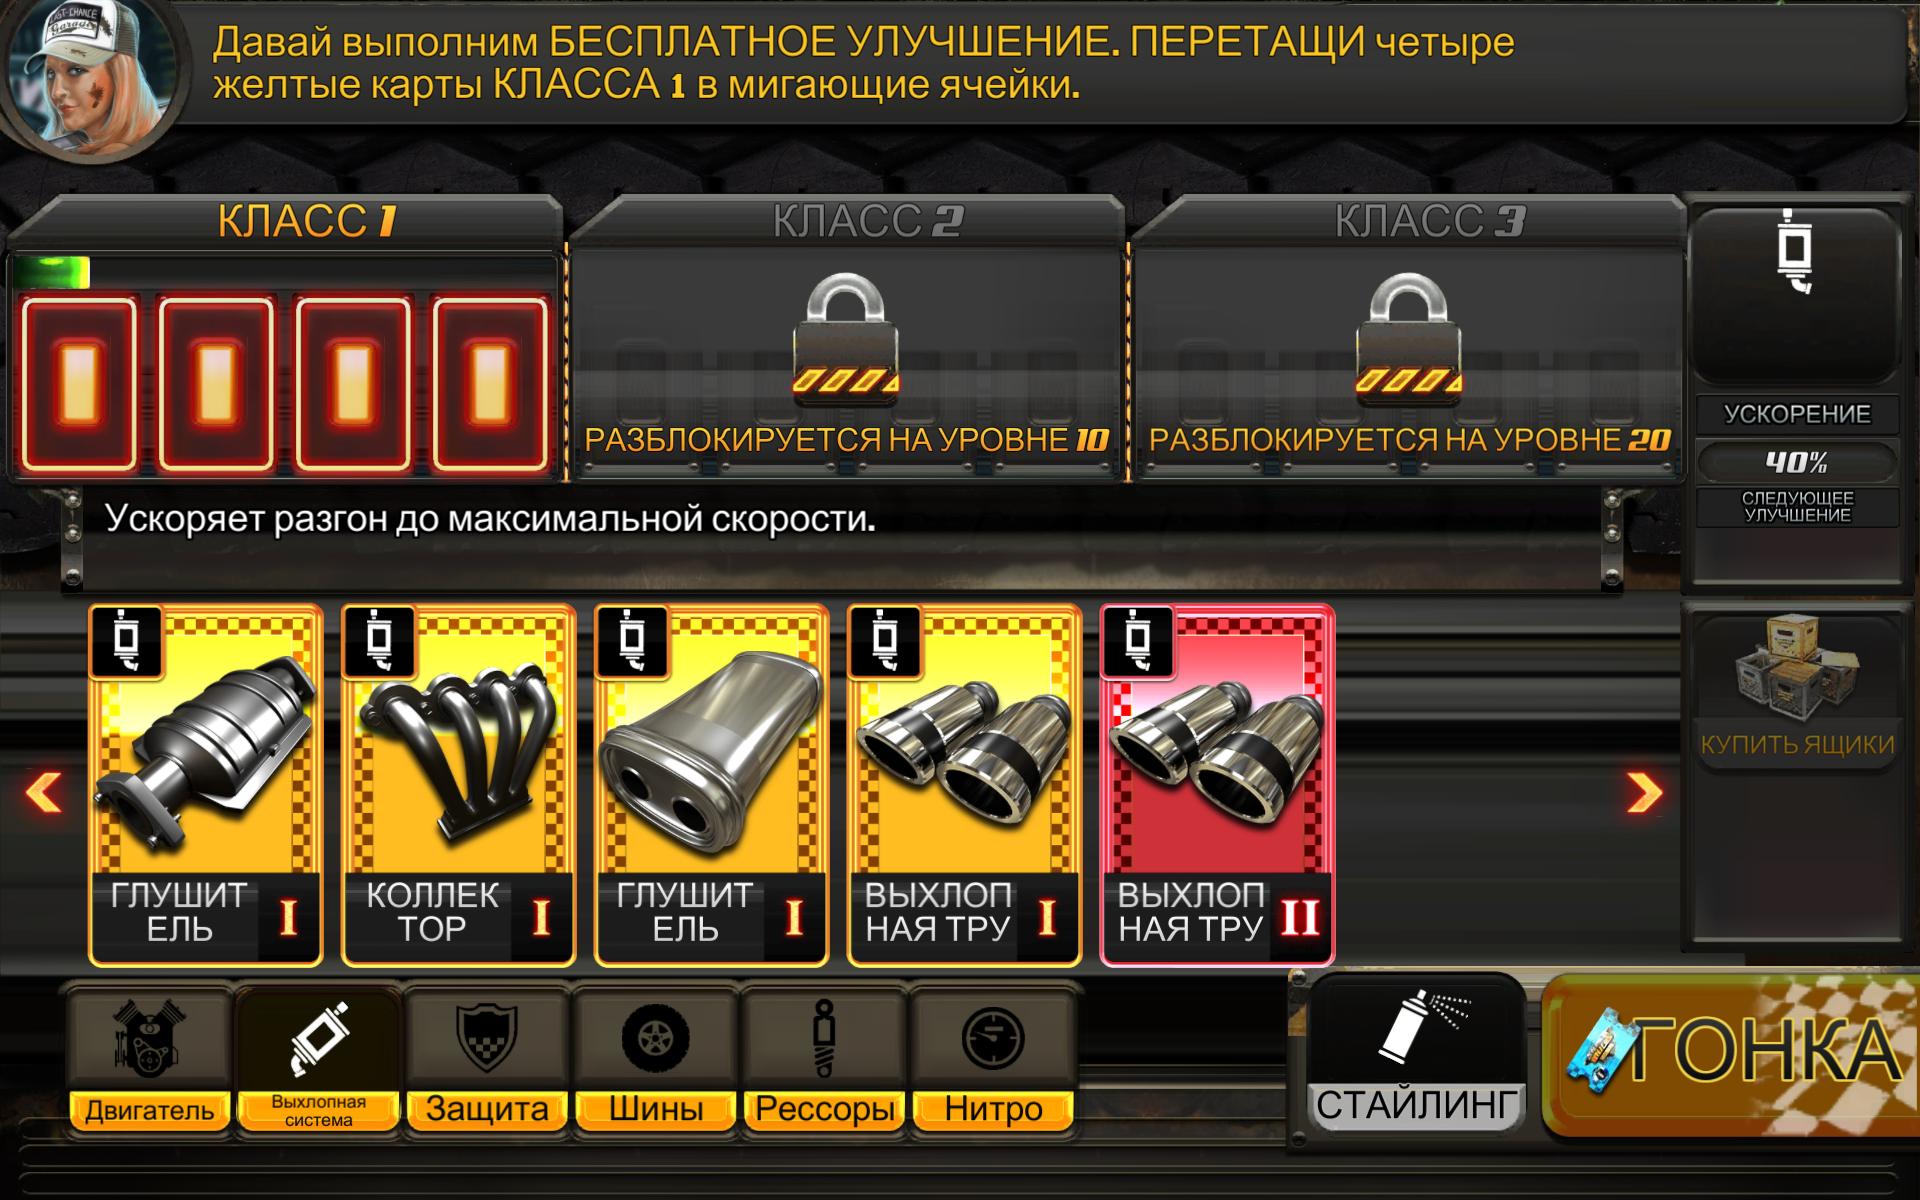 http://i3.imageban.ru/out/2018/01/14/c69e21d119f4db268c4422467d7d5e2c.png